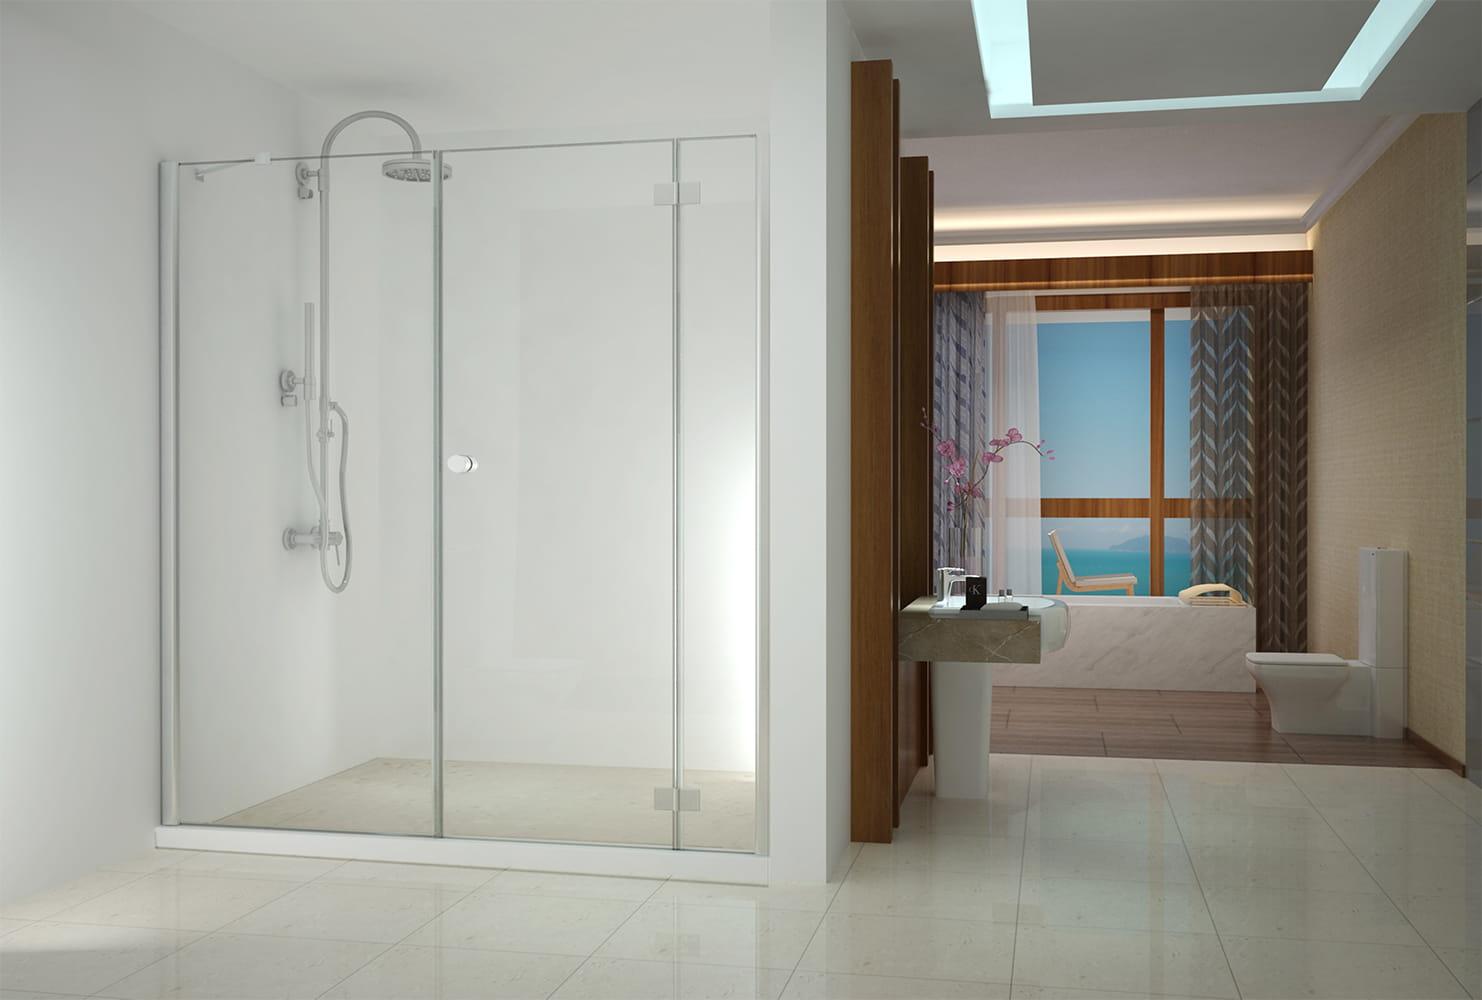 Sanotechnik - SMARTFLEX - Sprchové dvere do výklopného výklenku, pravé 210 x 195 cm